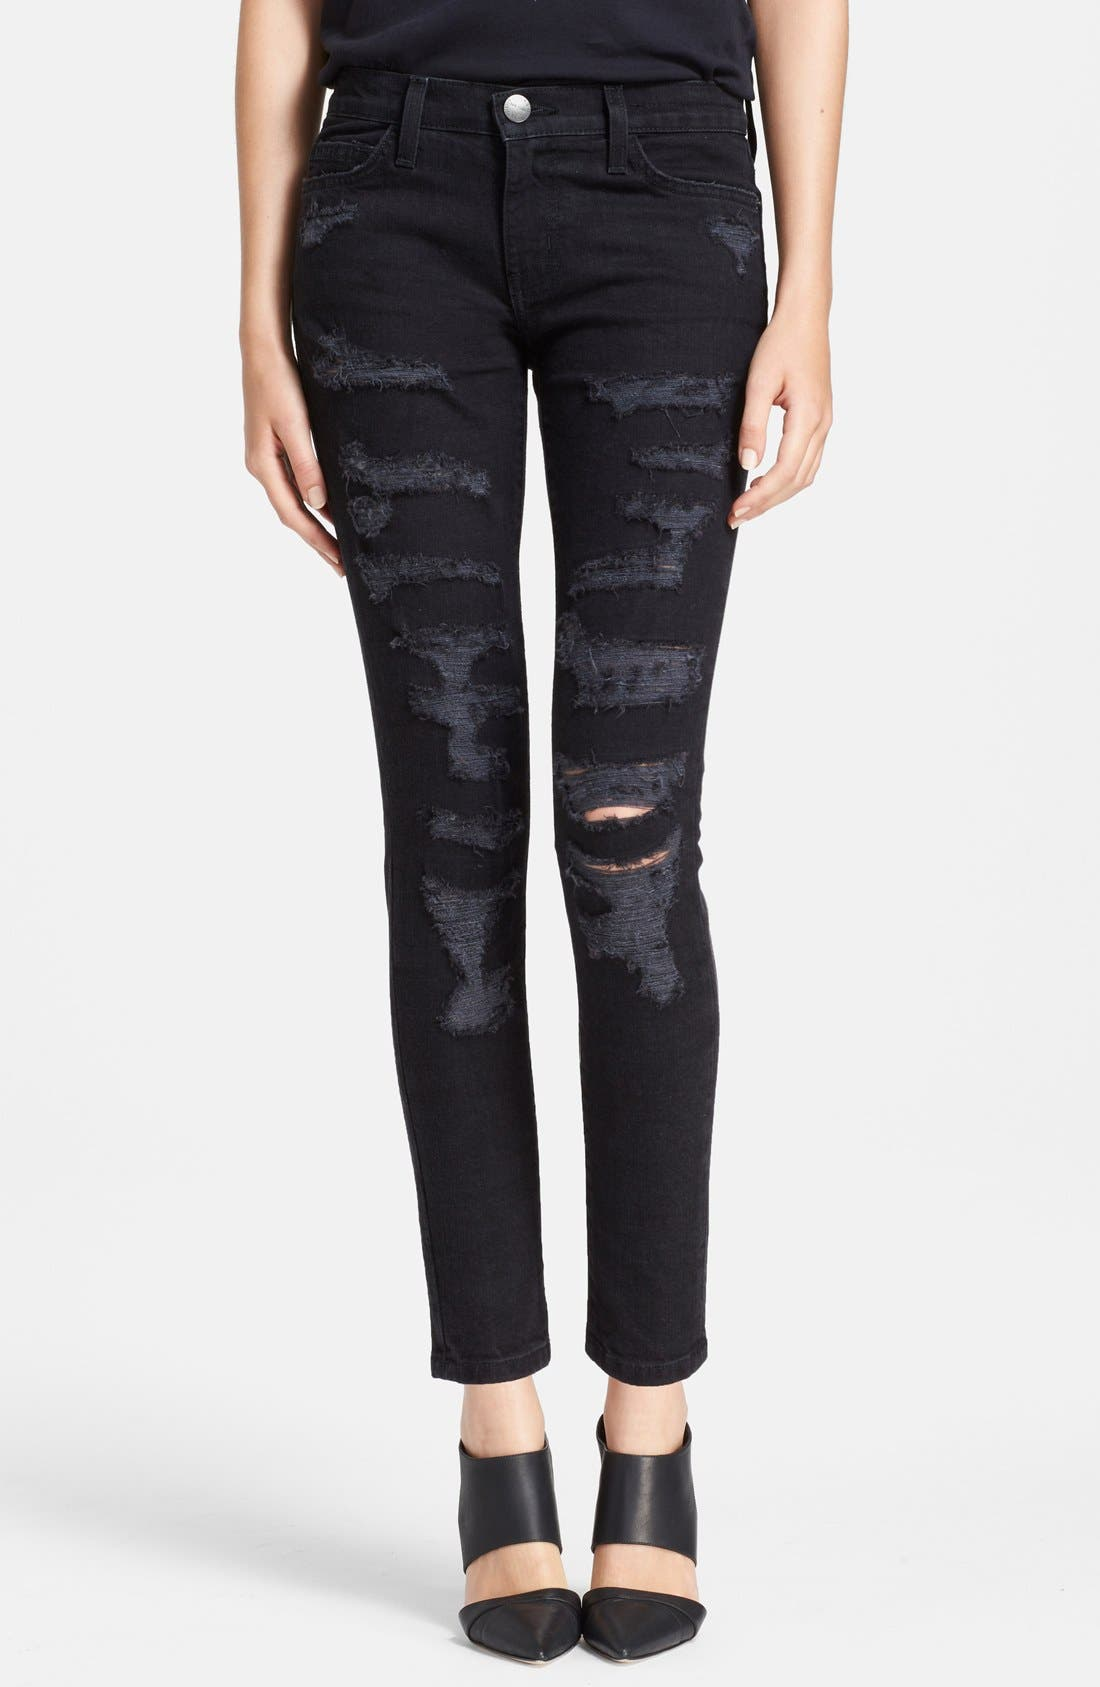 Alternate Image 1 Selected - Current/Elliott 'The Stiletto' Destroyed Skinny Jeans